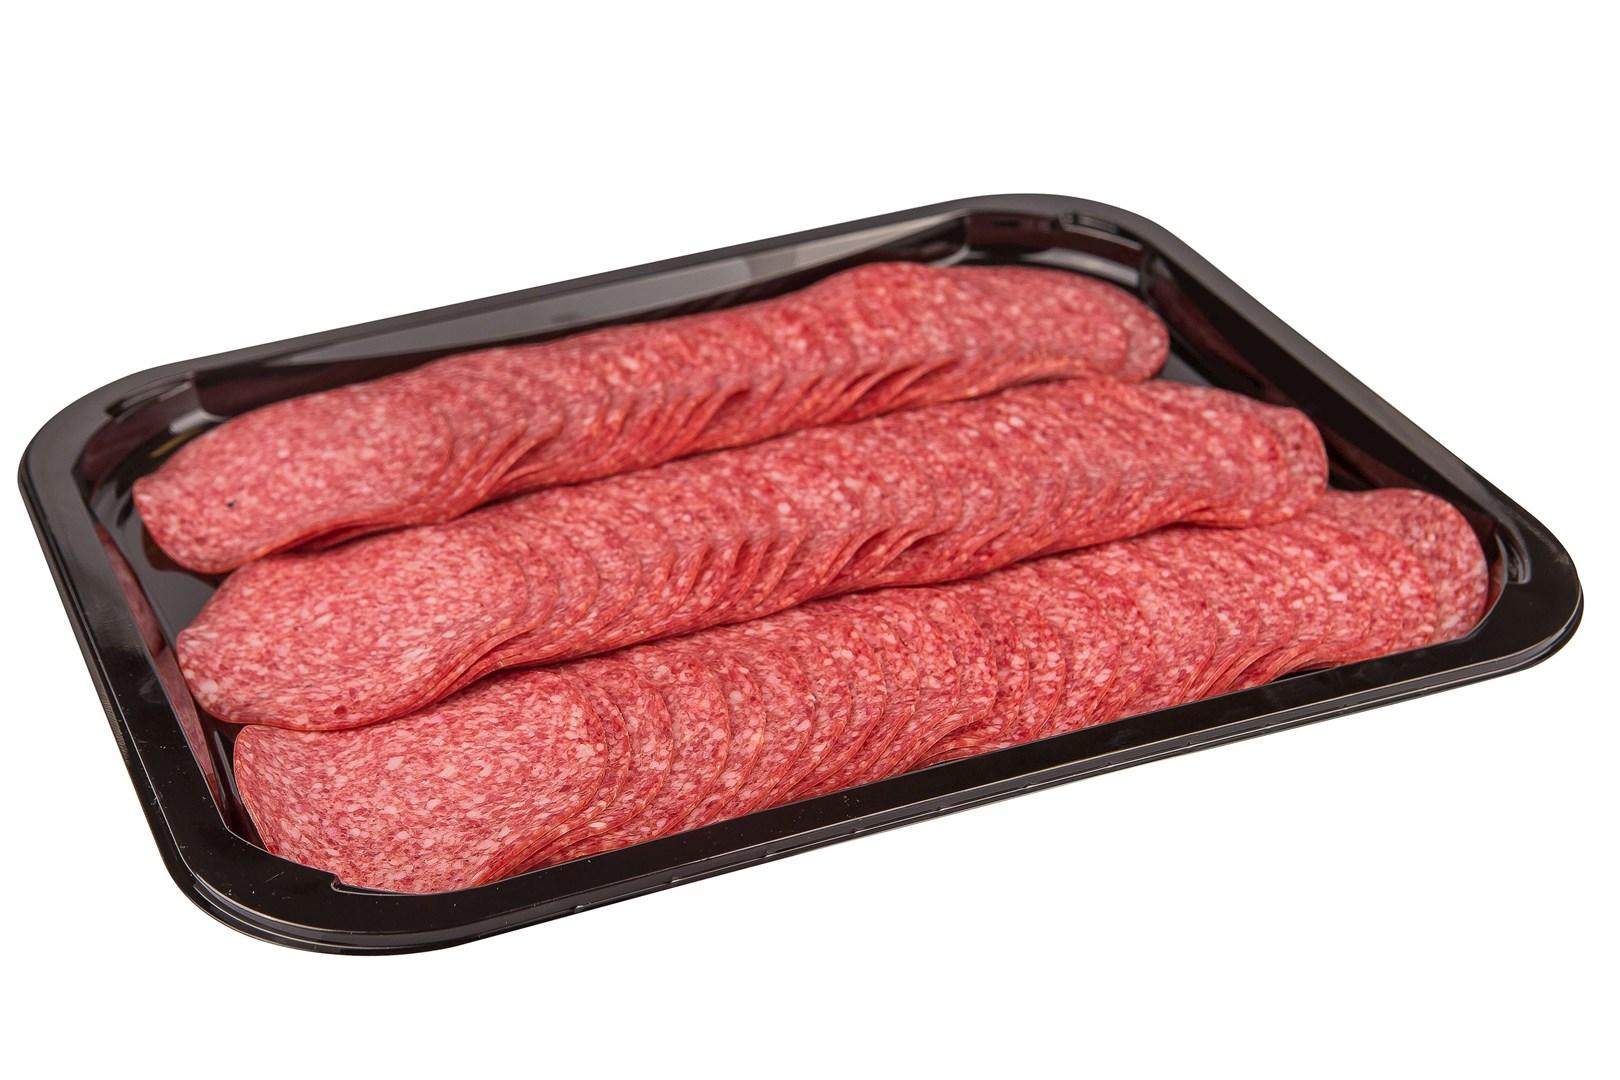 Productafbeelding Salami ca 1 kg